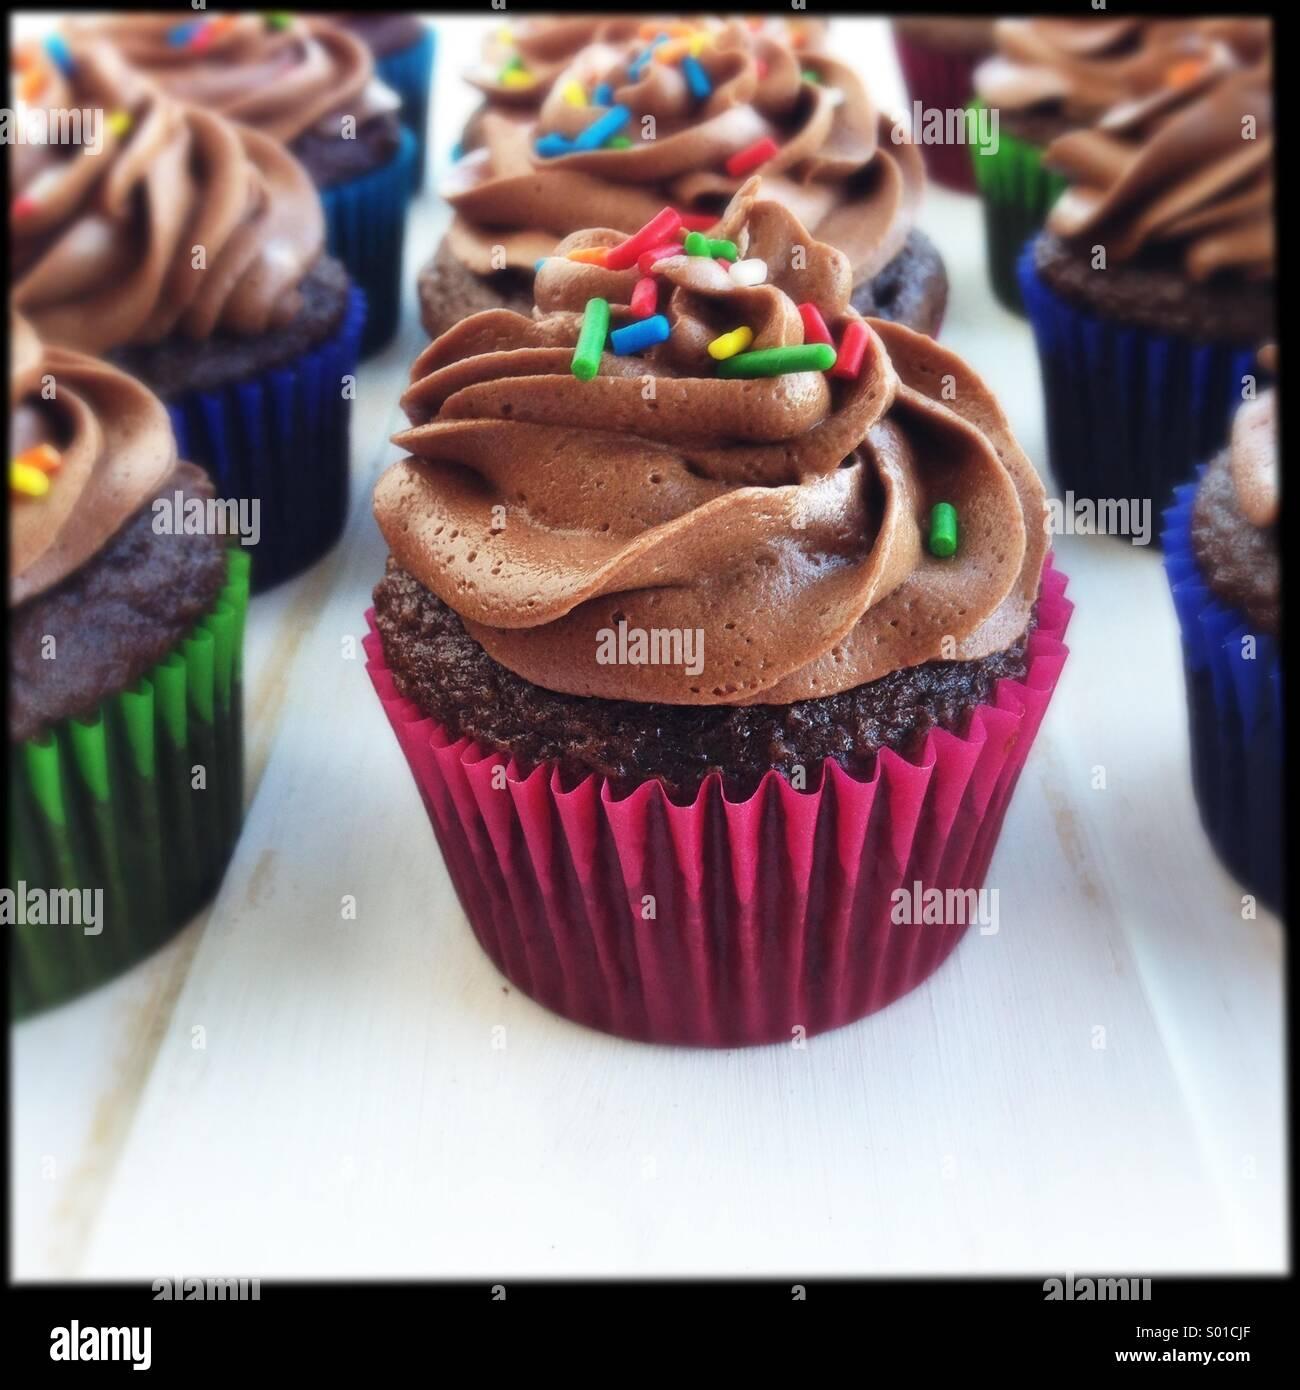 Schokoladentörtchen mit Streusel Stockbild